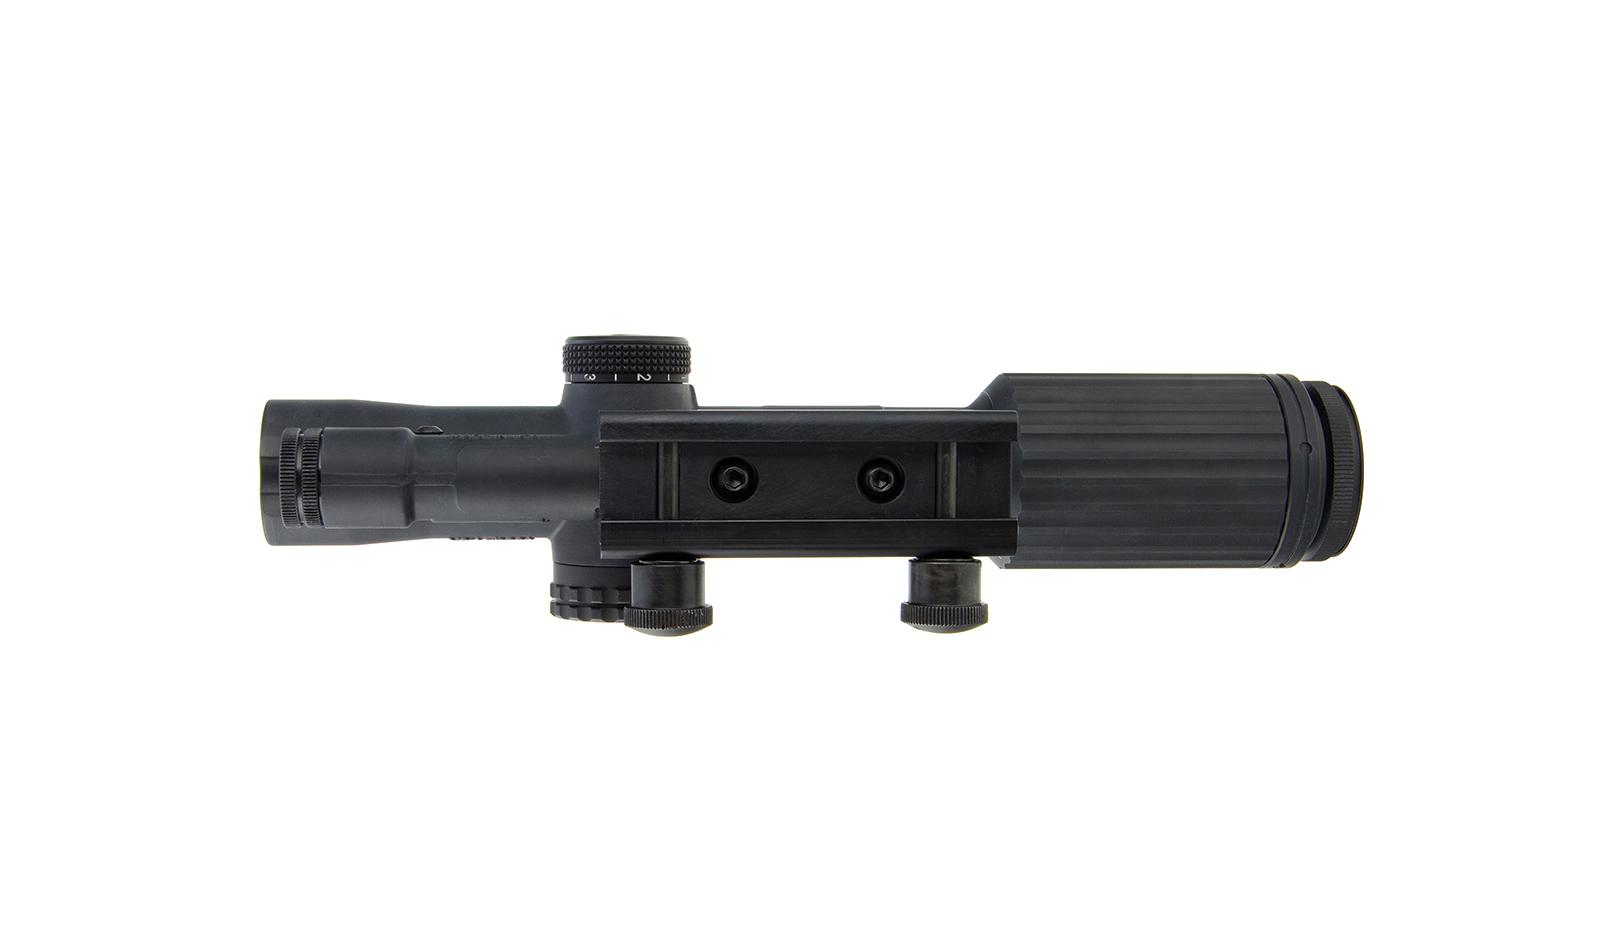 VC16-C-1600002 angle 10